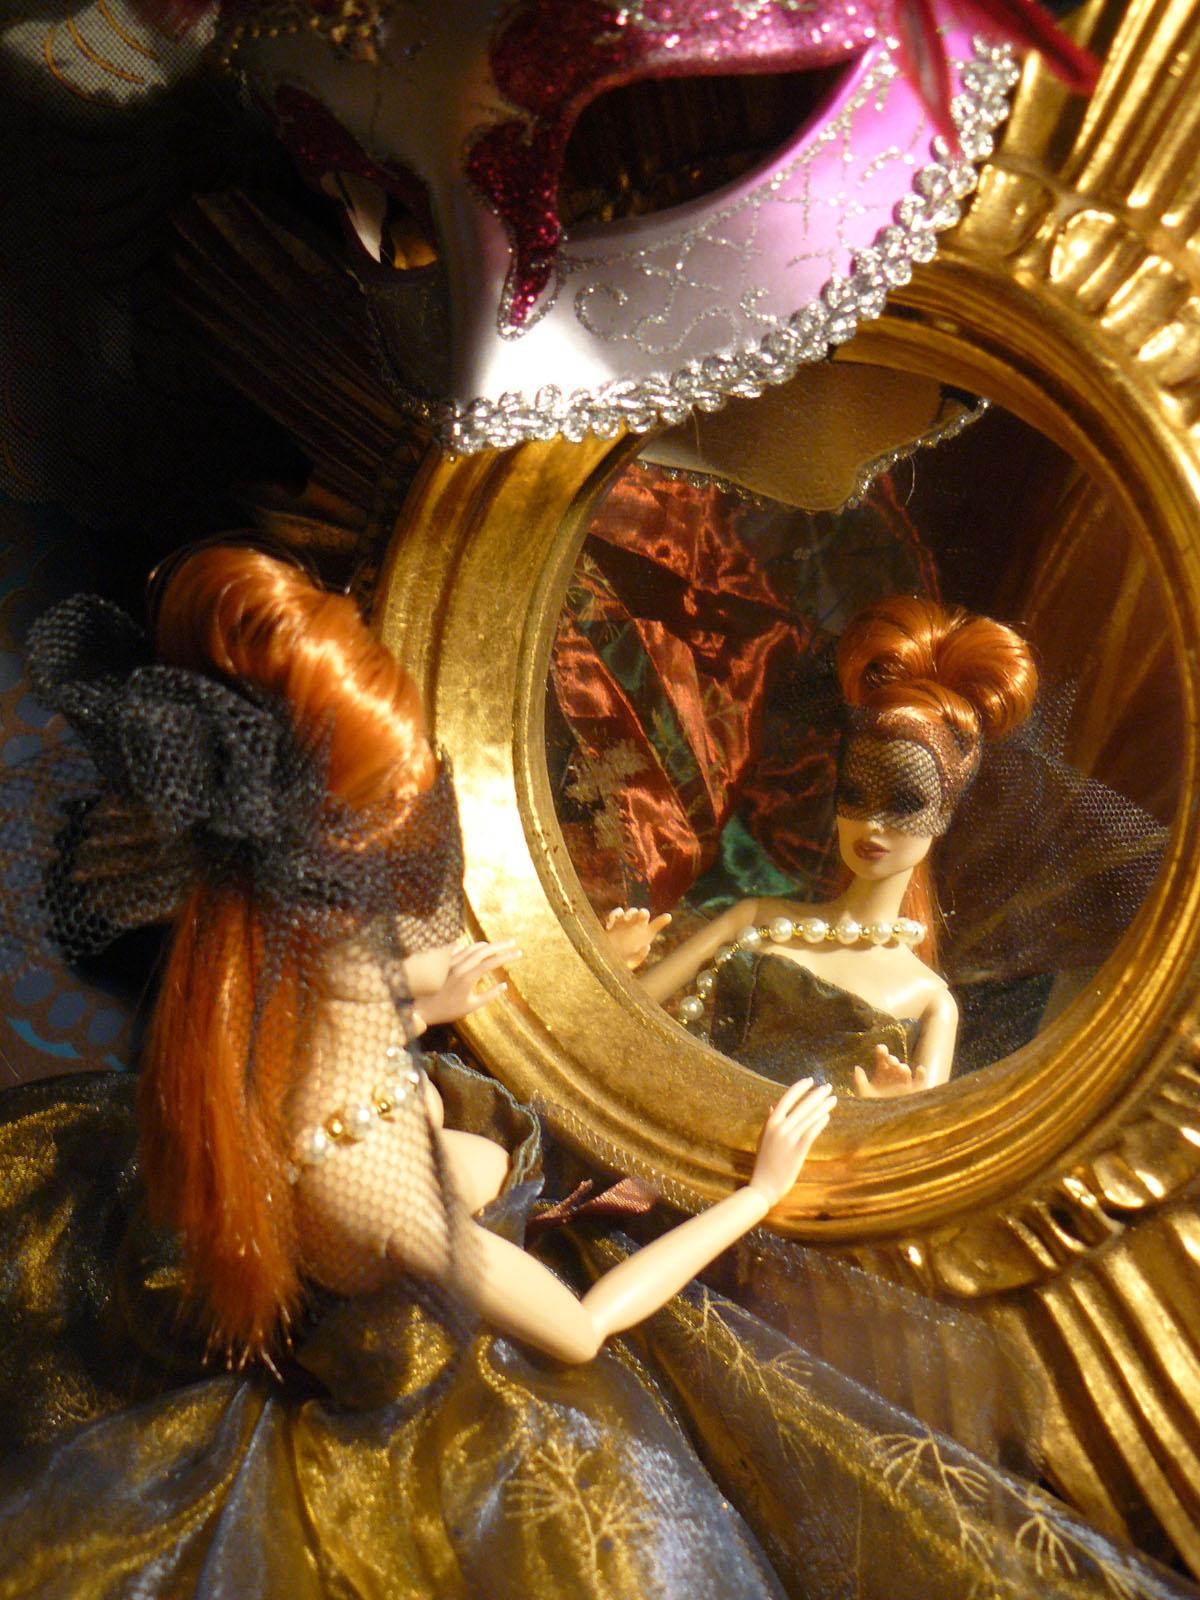 Miroir mon beau miroir by elbereth de lioncour on deviantart for Miroir o beau miroir